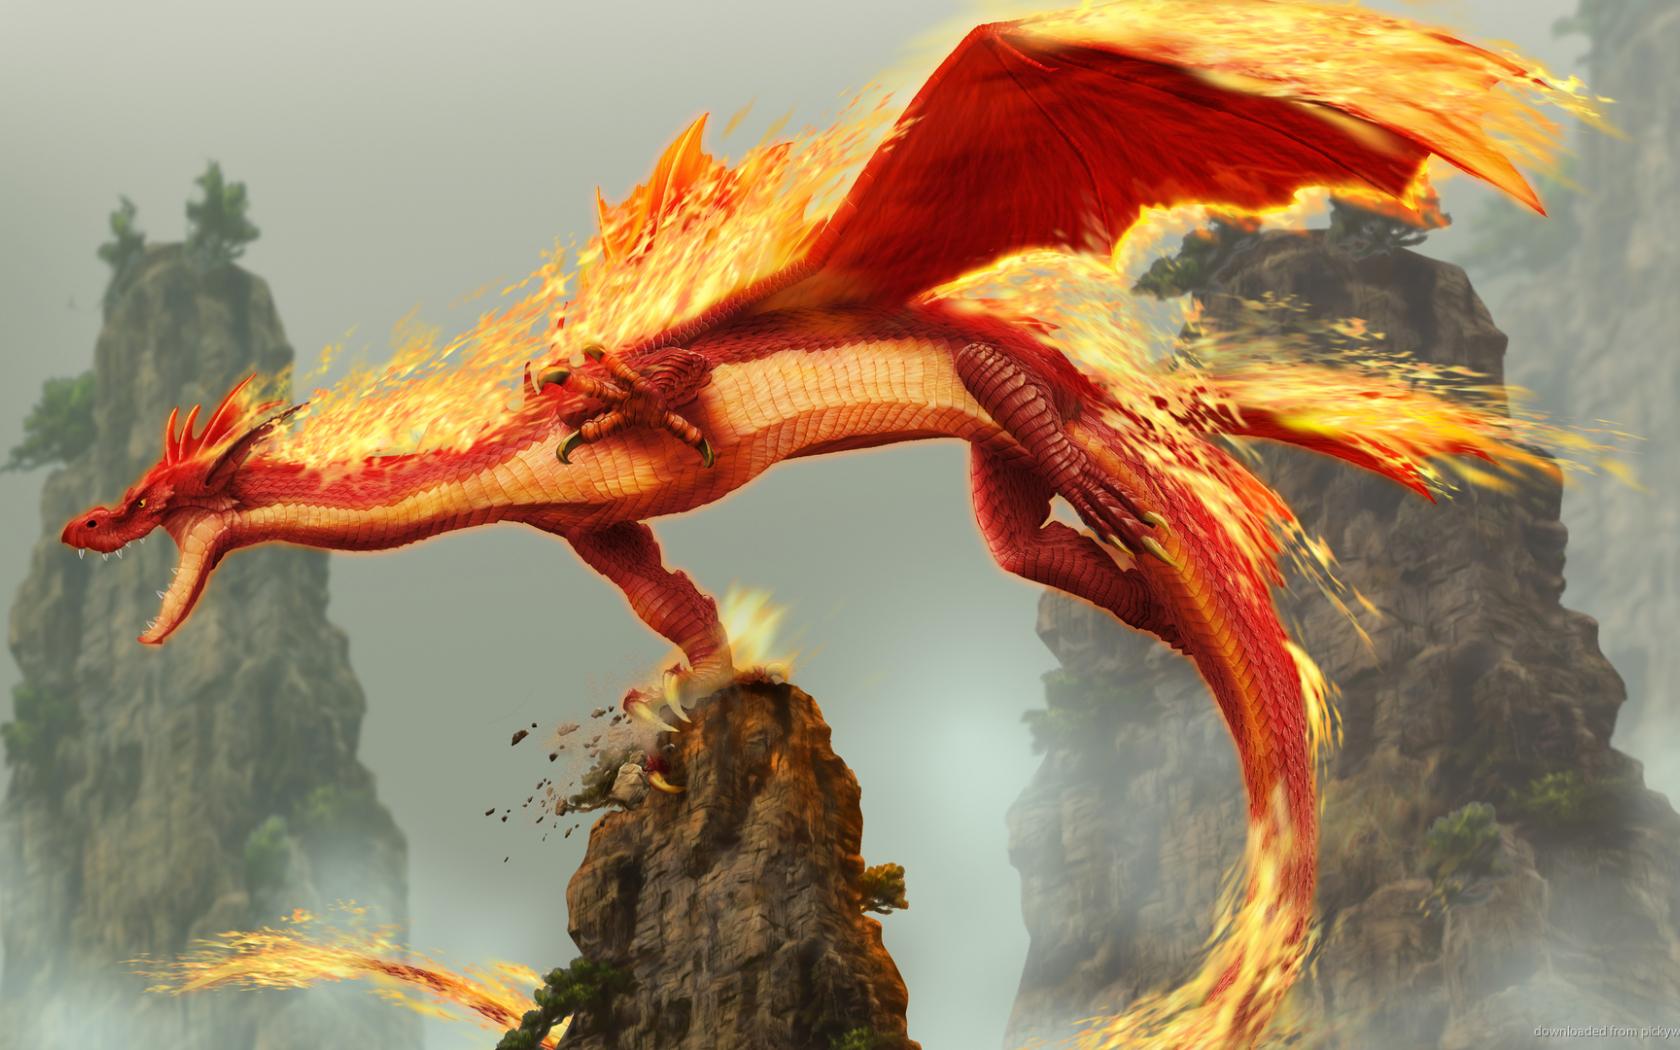 Dragon Wallpaper Fire Fantasy 1920x1080 Download Resolutions Desktop